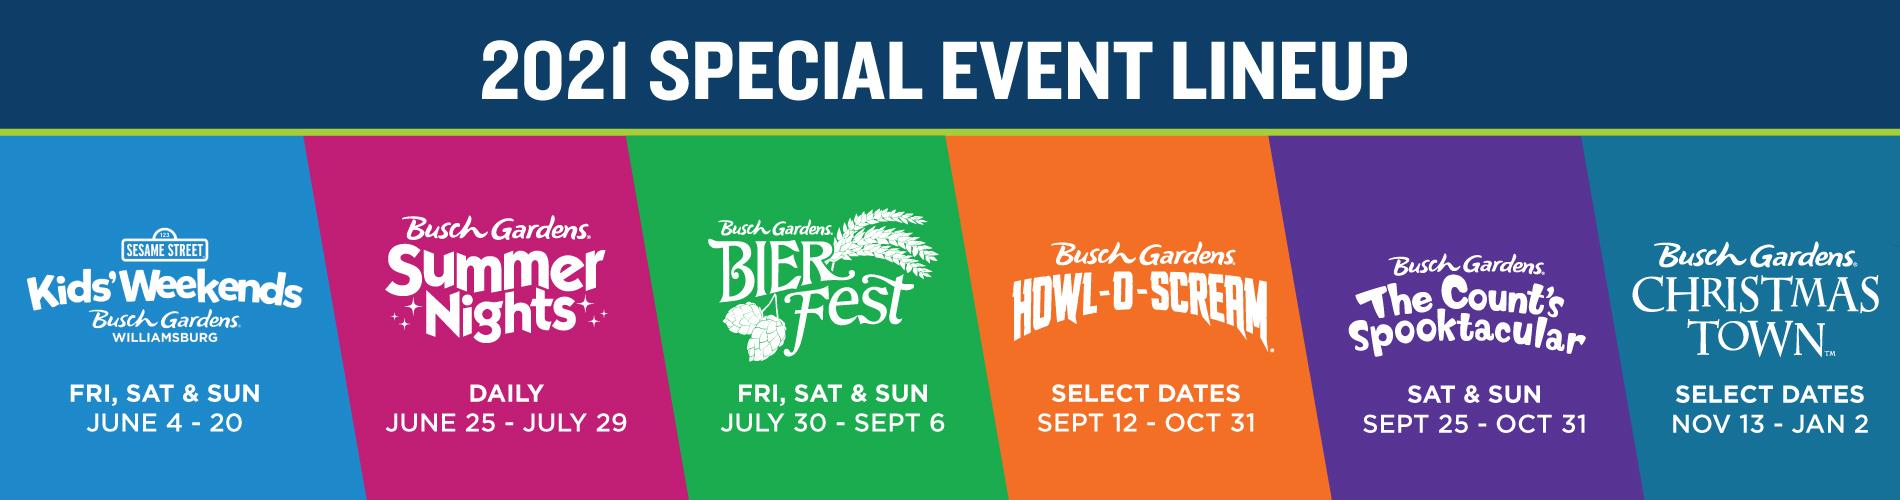 2021 Special Event Lineup at Busch Gardens